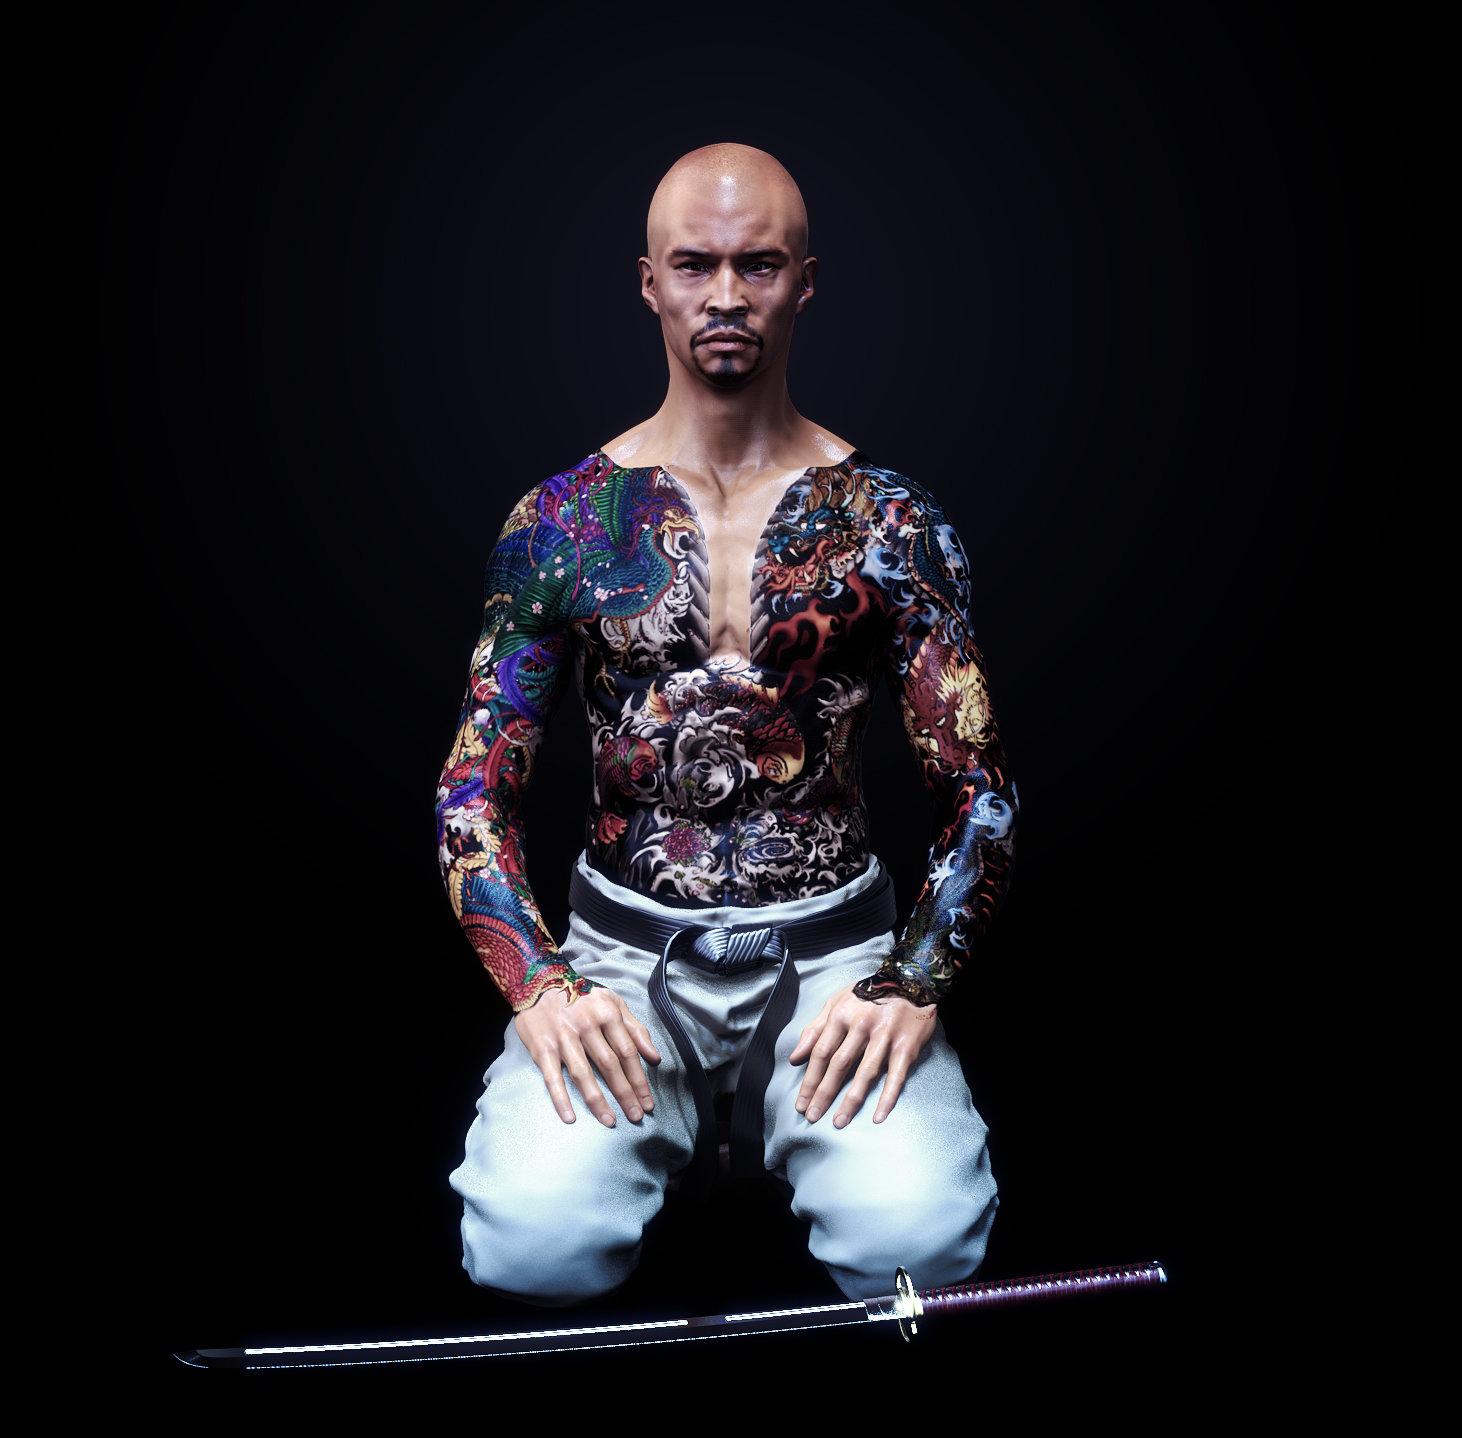 Pawel libiszewski lowang meditation 01